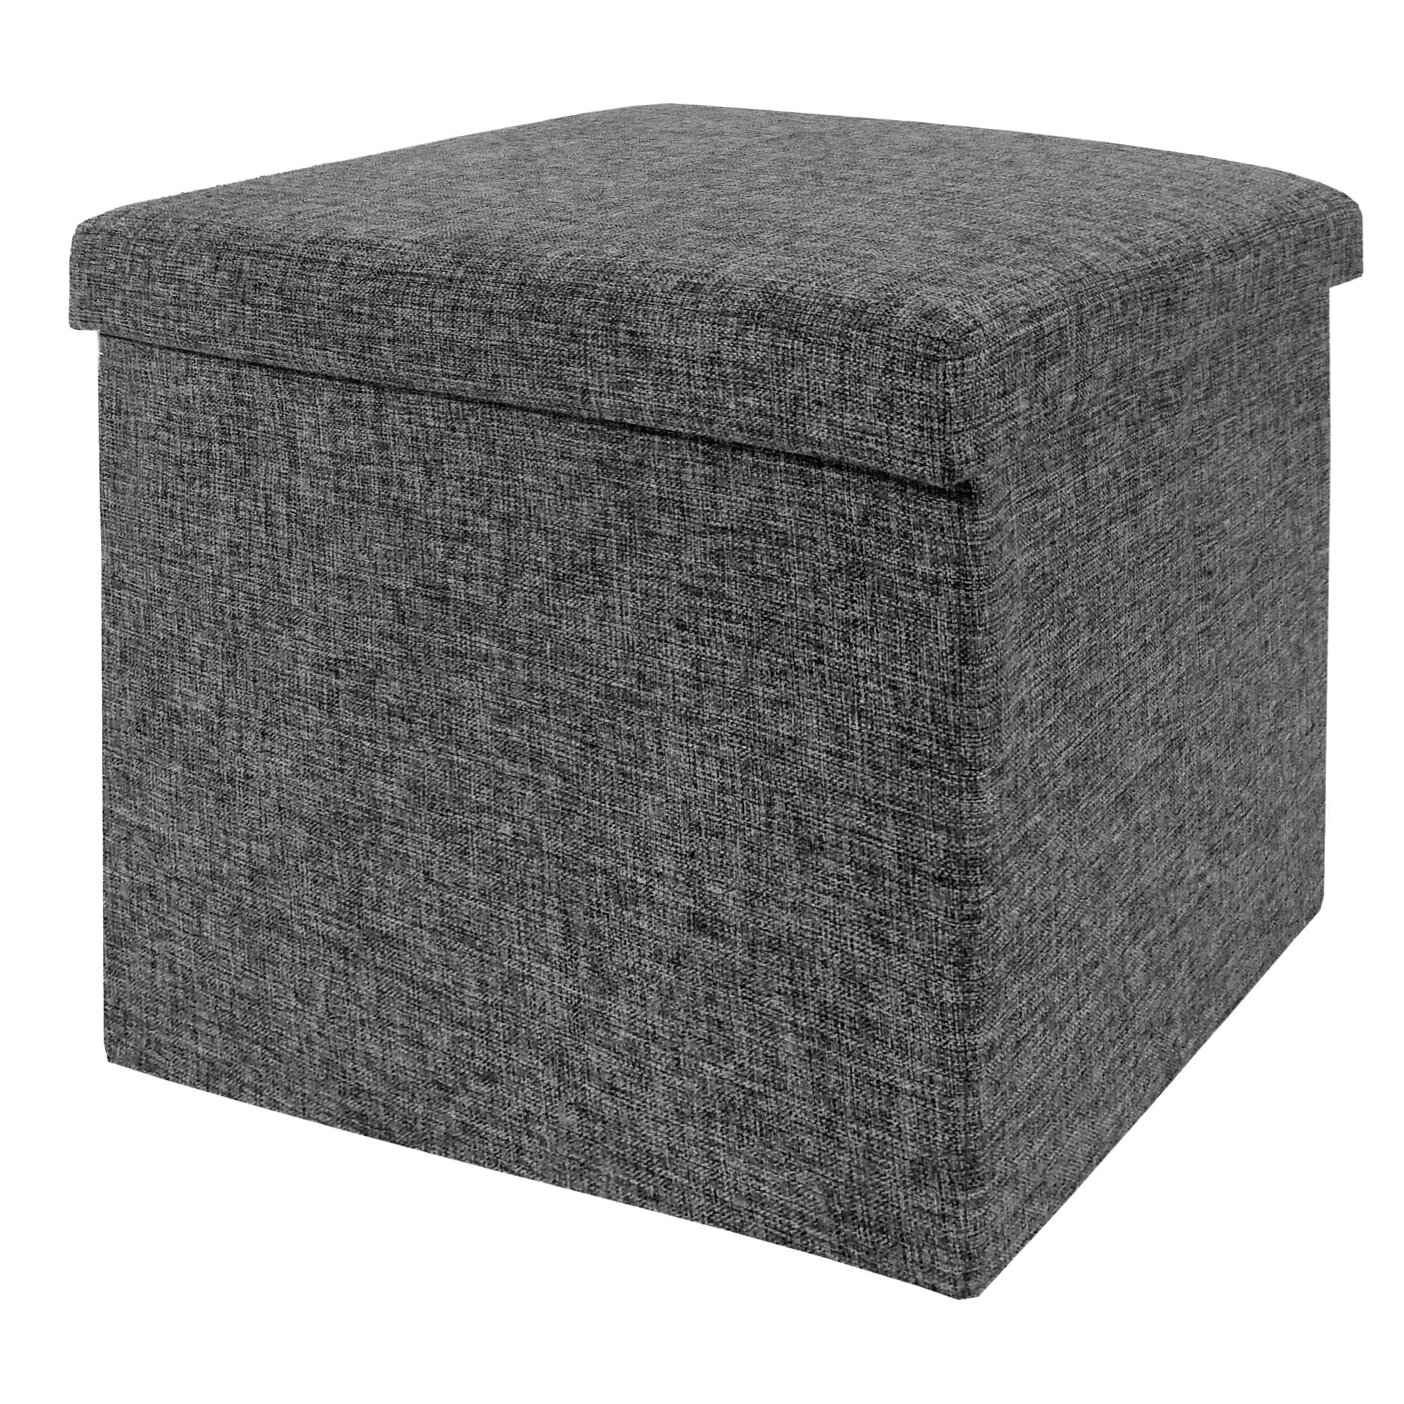 Zipcode™ Design Zosia Foldable Storage Foot Stool Cube Ottoman & Reviews |  Wayfair - Zipcode™ Design Zosia Foldable Storage Foot Stool Cube Ottoman